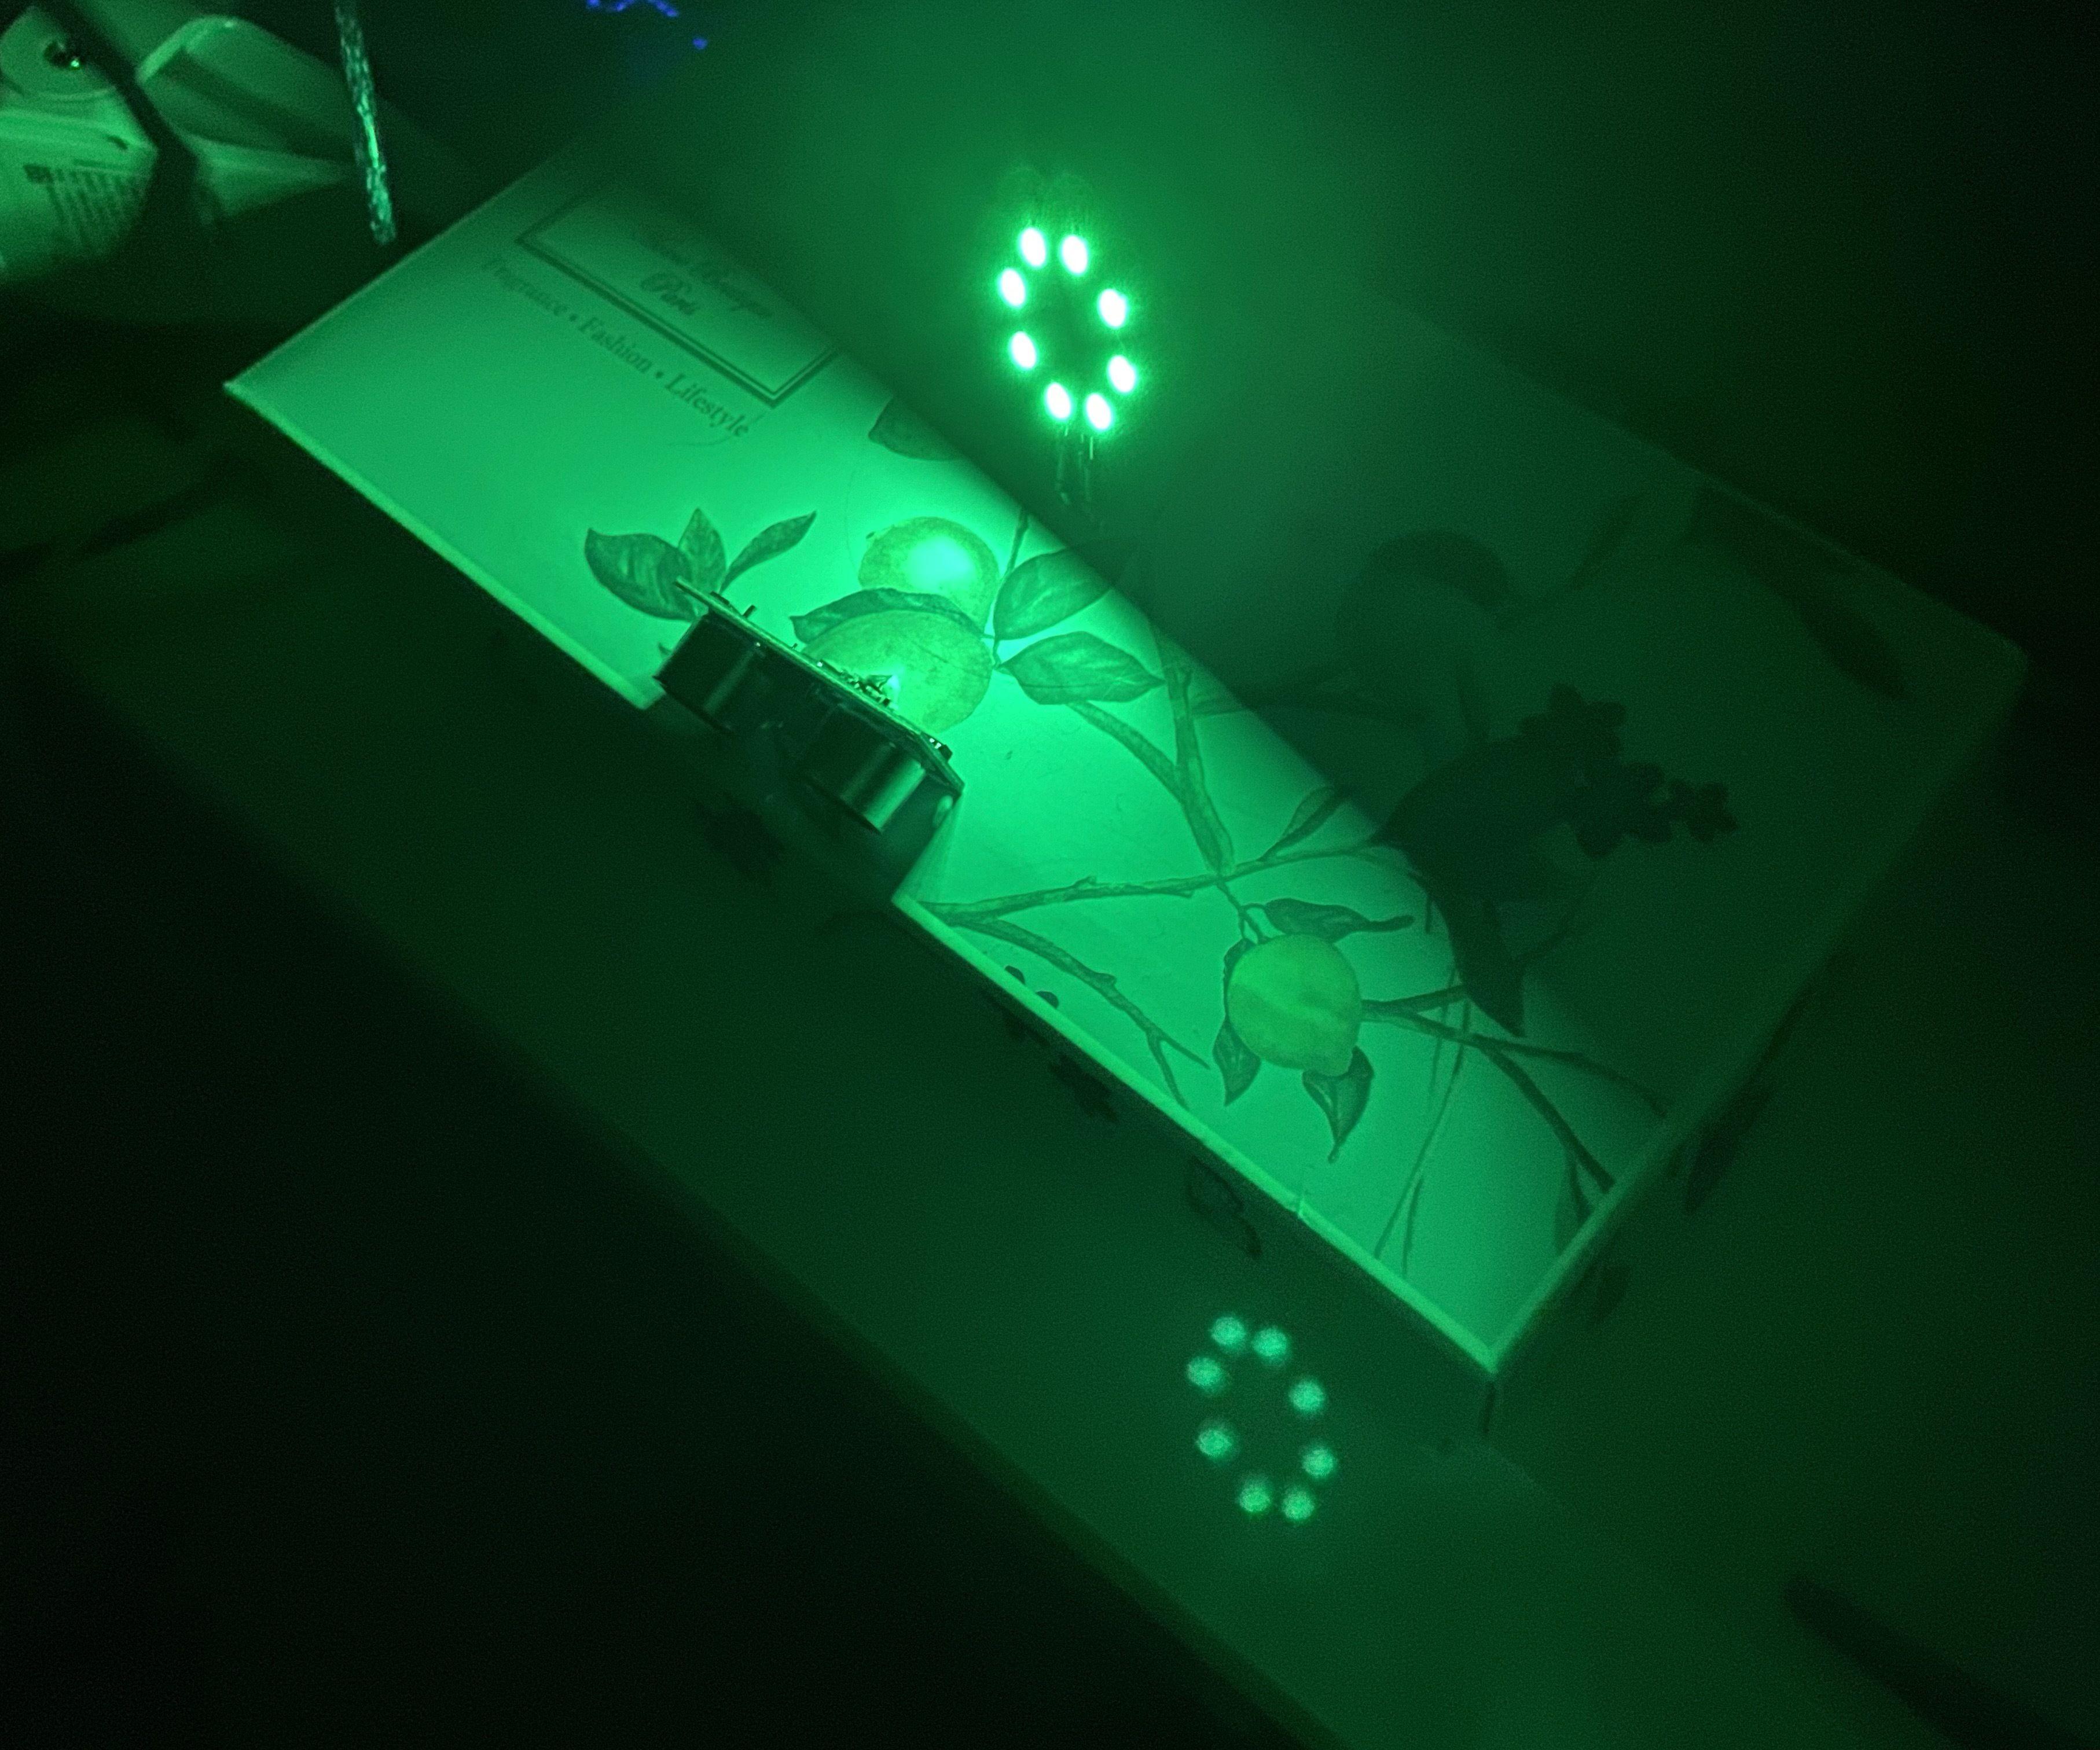 Distance Sensor(HC-SR04) W/ LED Ring